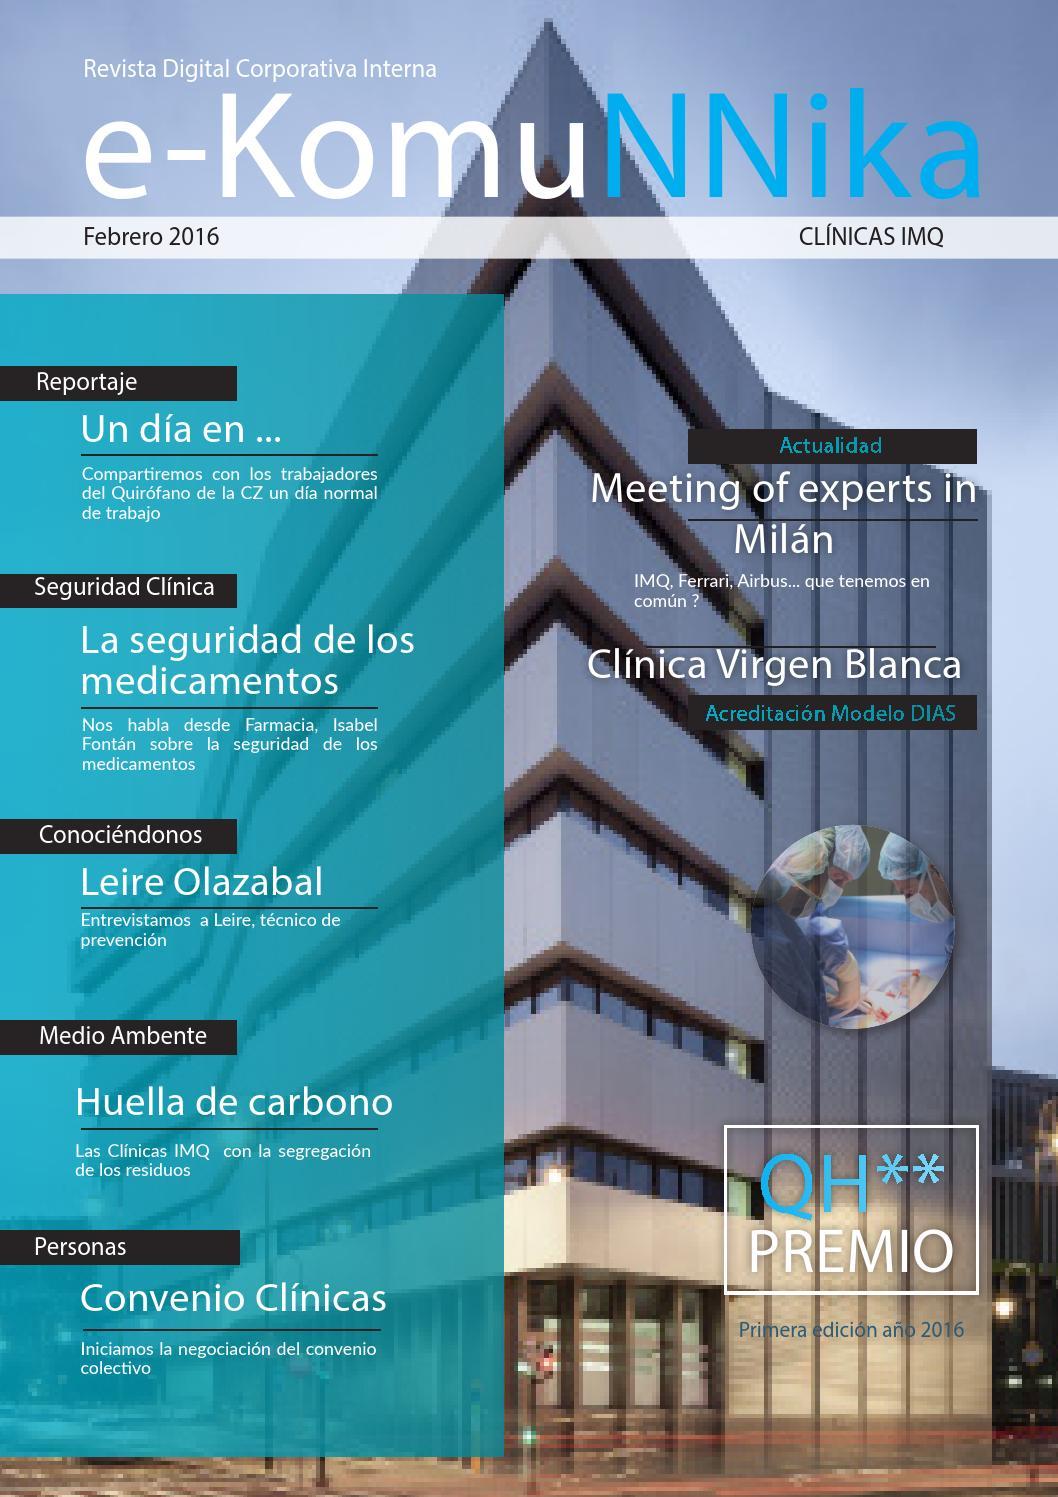 Revista digital clinicas imq febrero 16 by CLINICAS IMQ - issuu